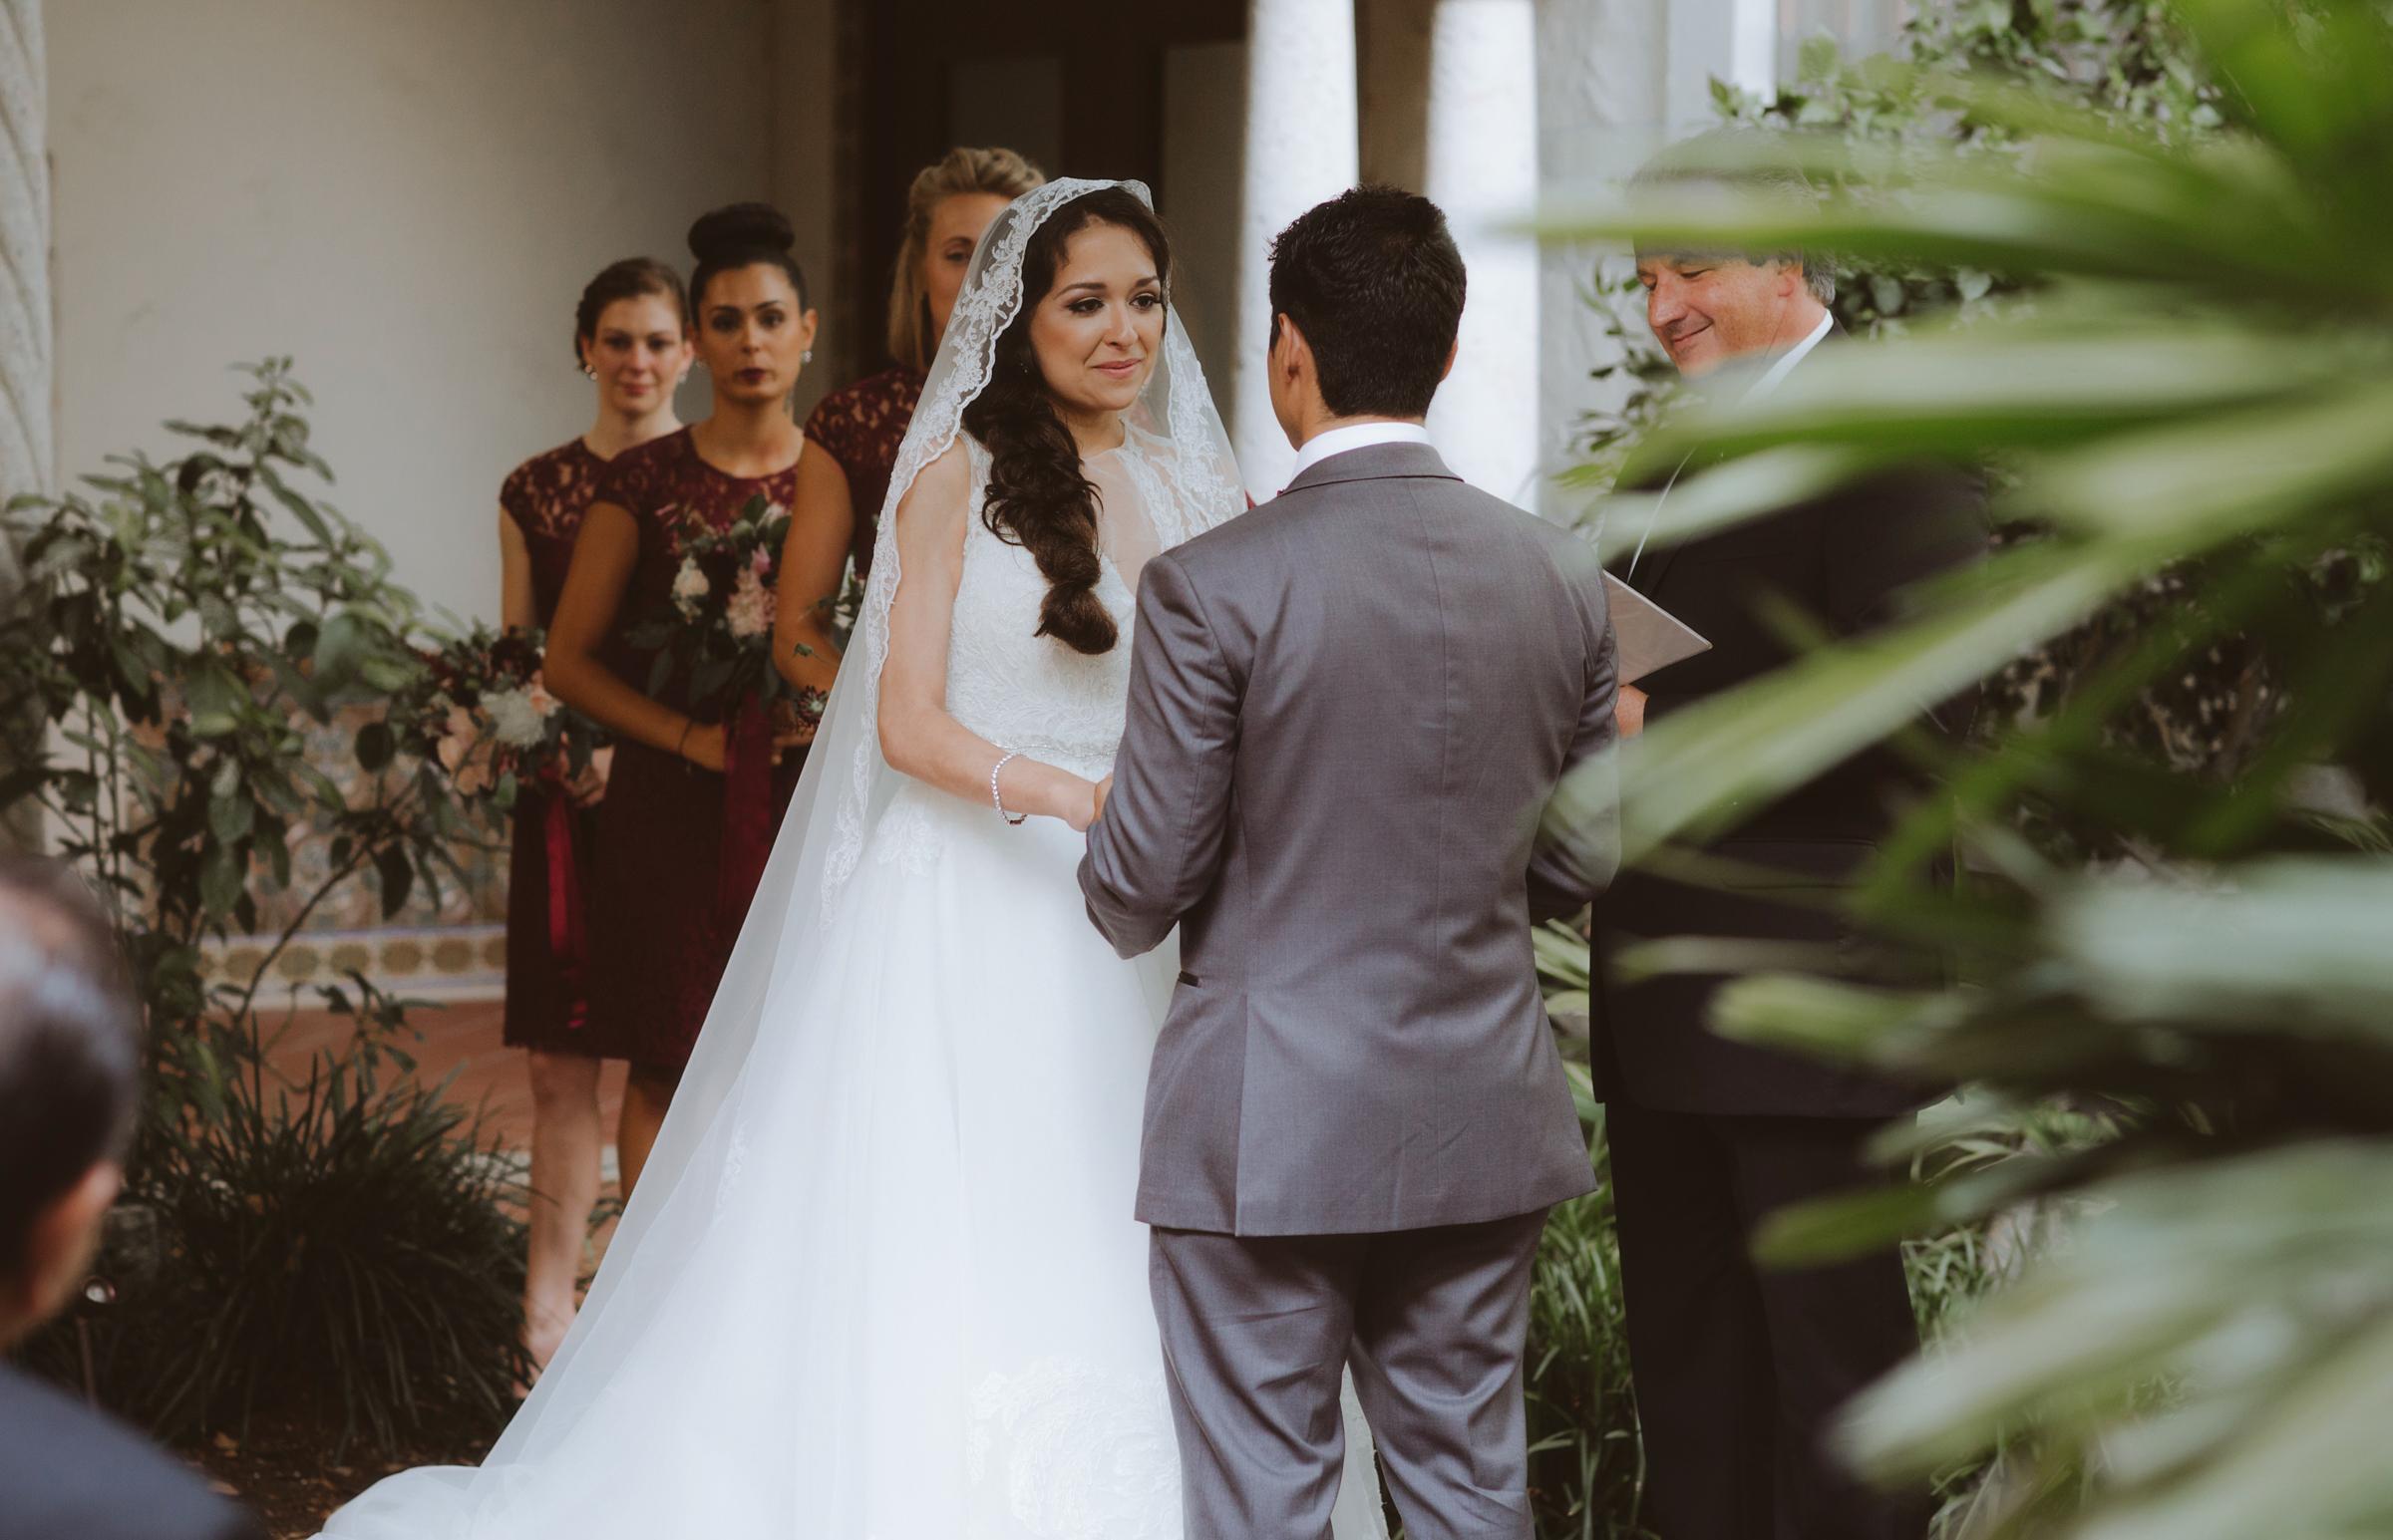 wedding day | MFA St Pete | Vanessa Boy Photography | vanessaboy.com-355.com |final.jpg